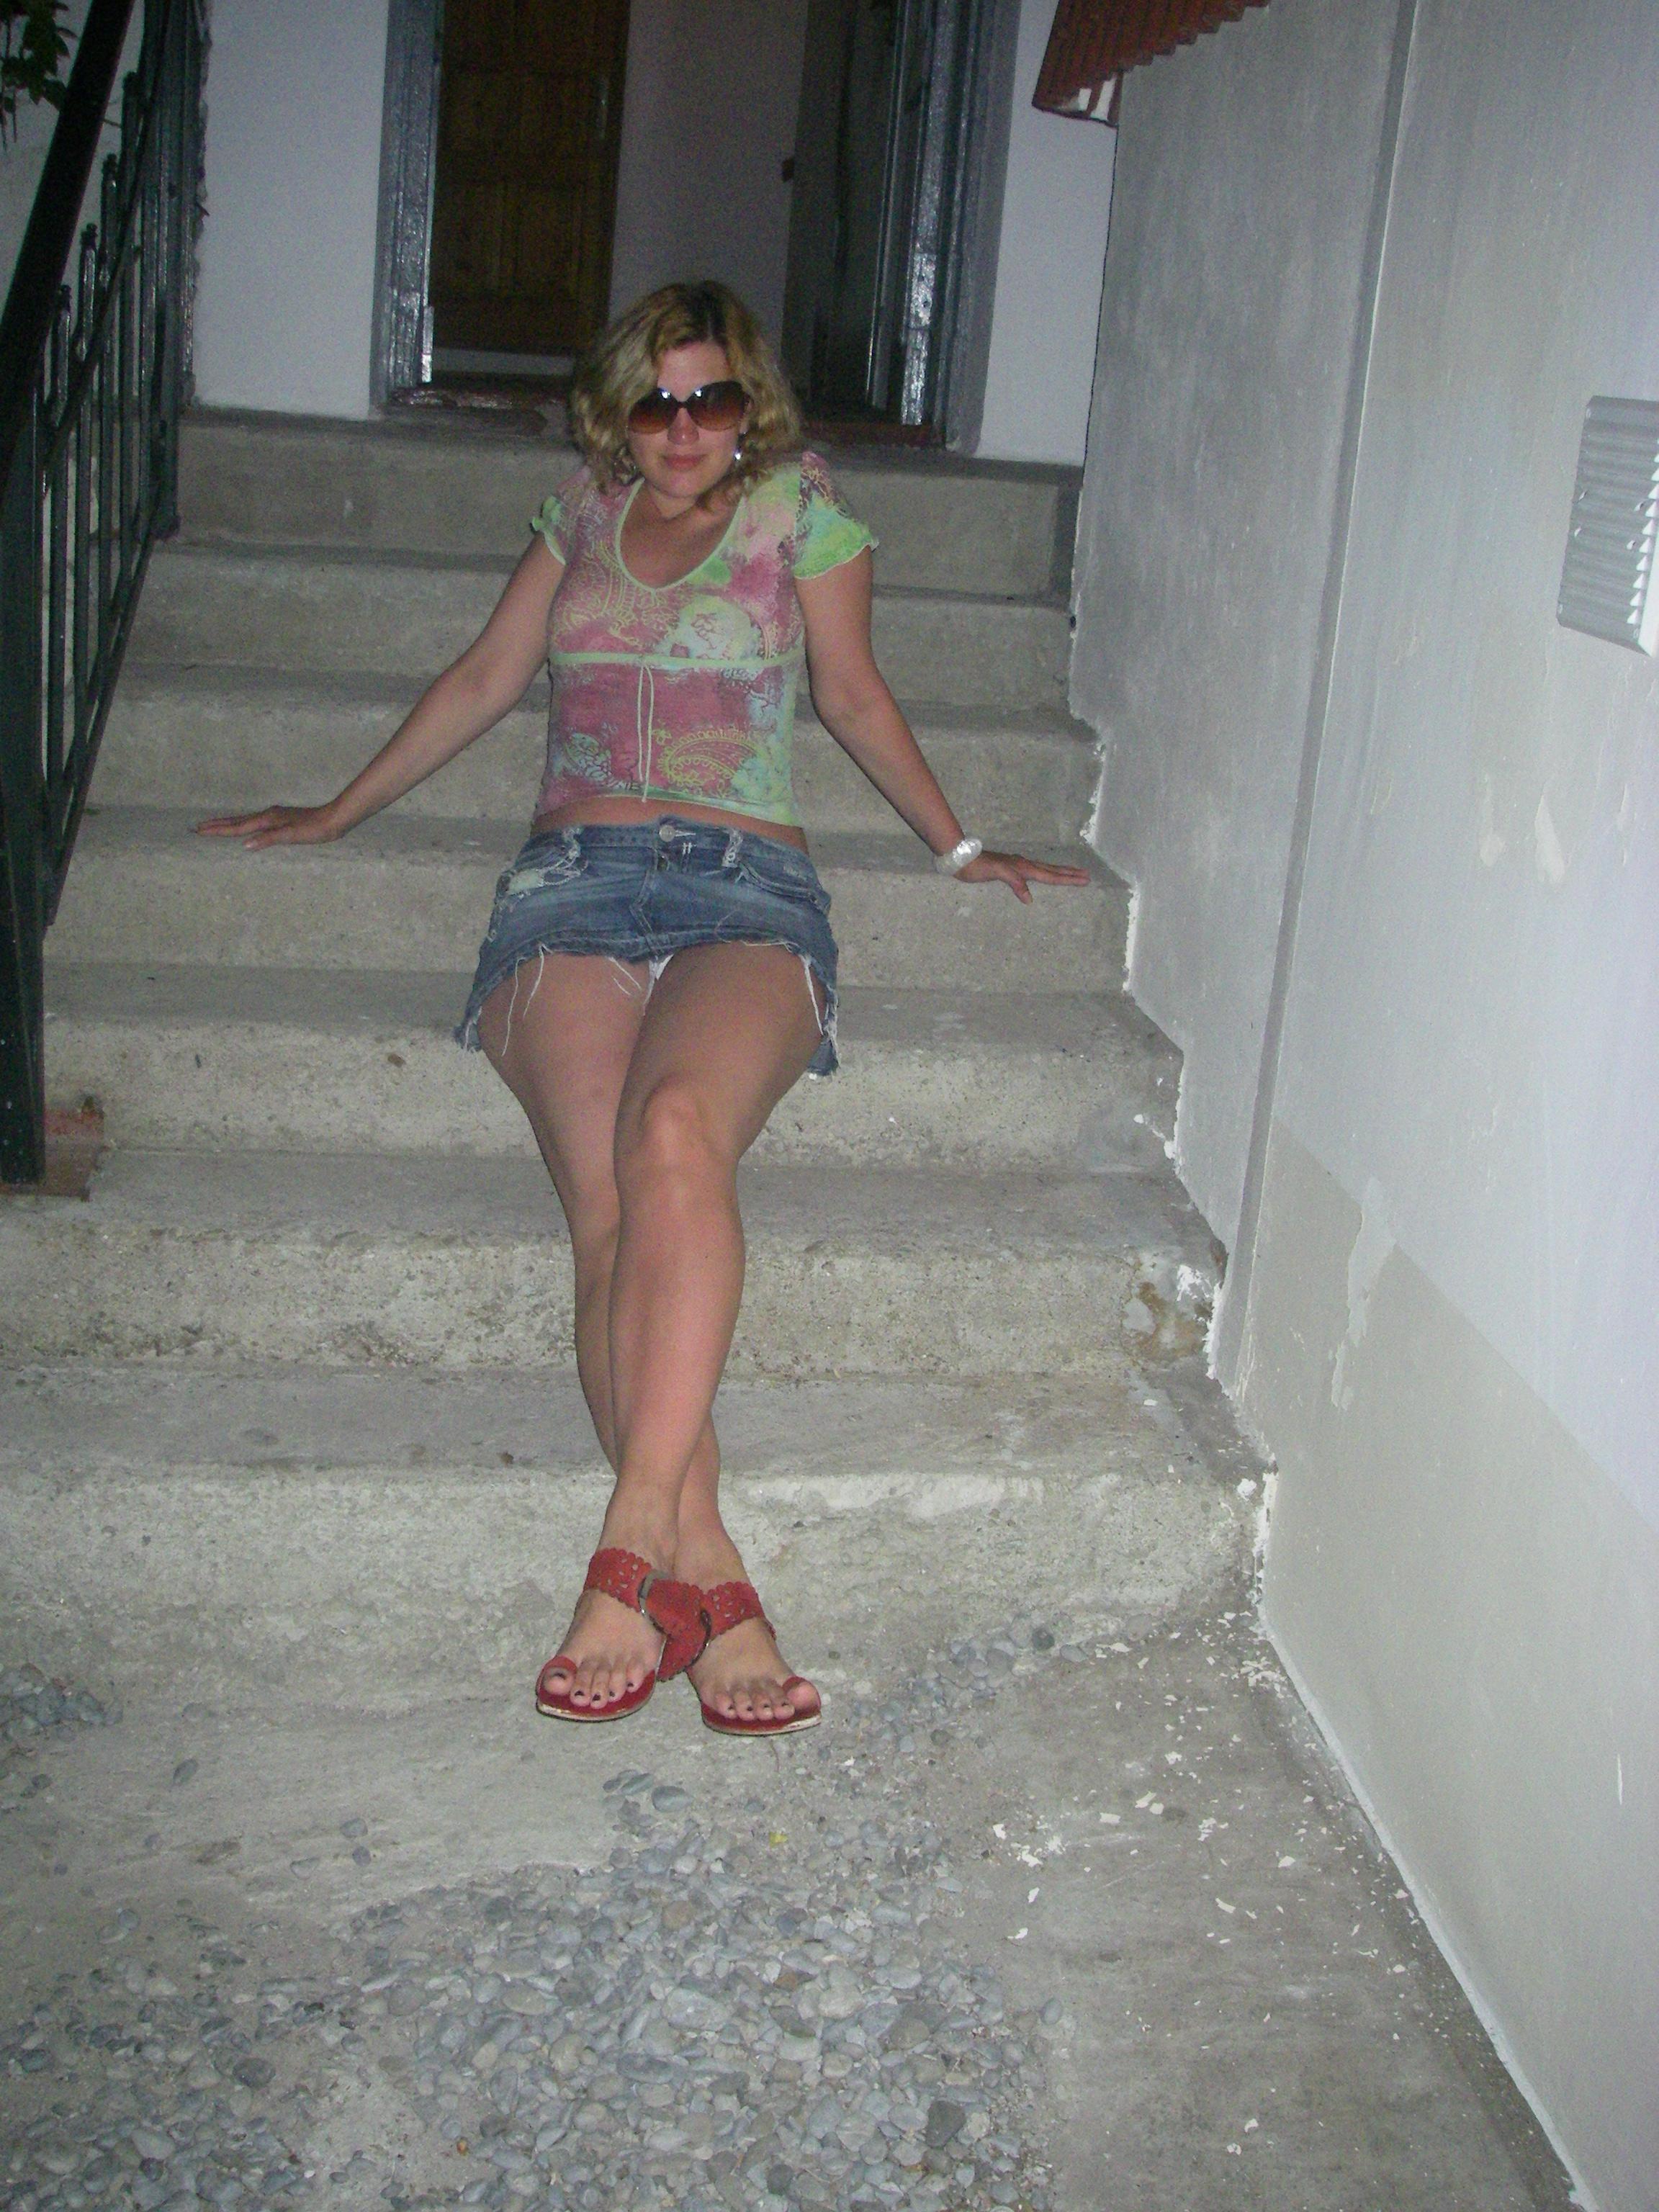 Девушка в мини-юбке засветила в подъезде белые трусики